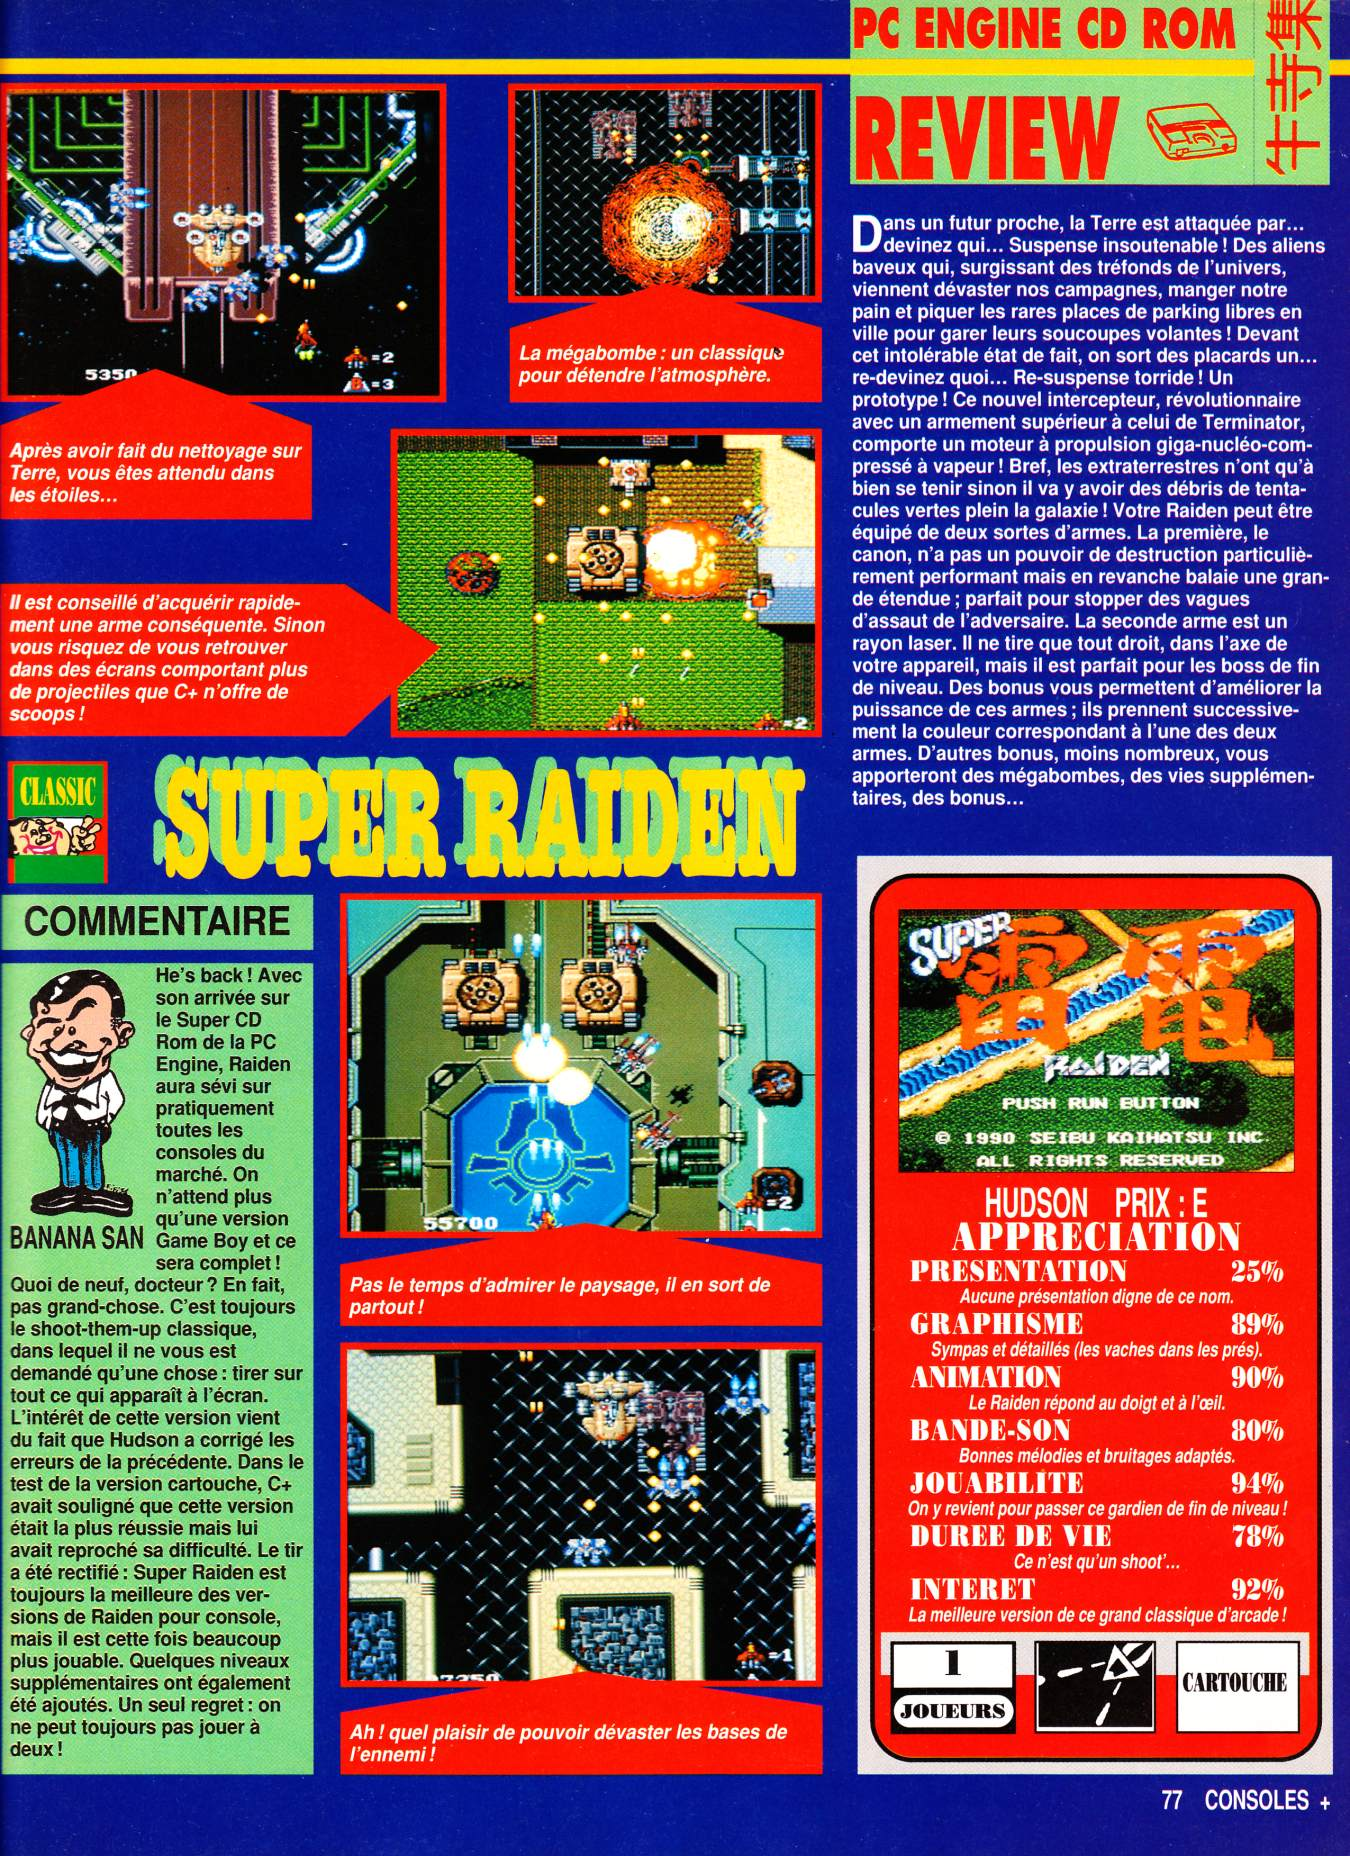 Raiden (video game) - Wikipedia